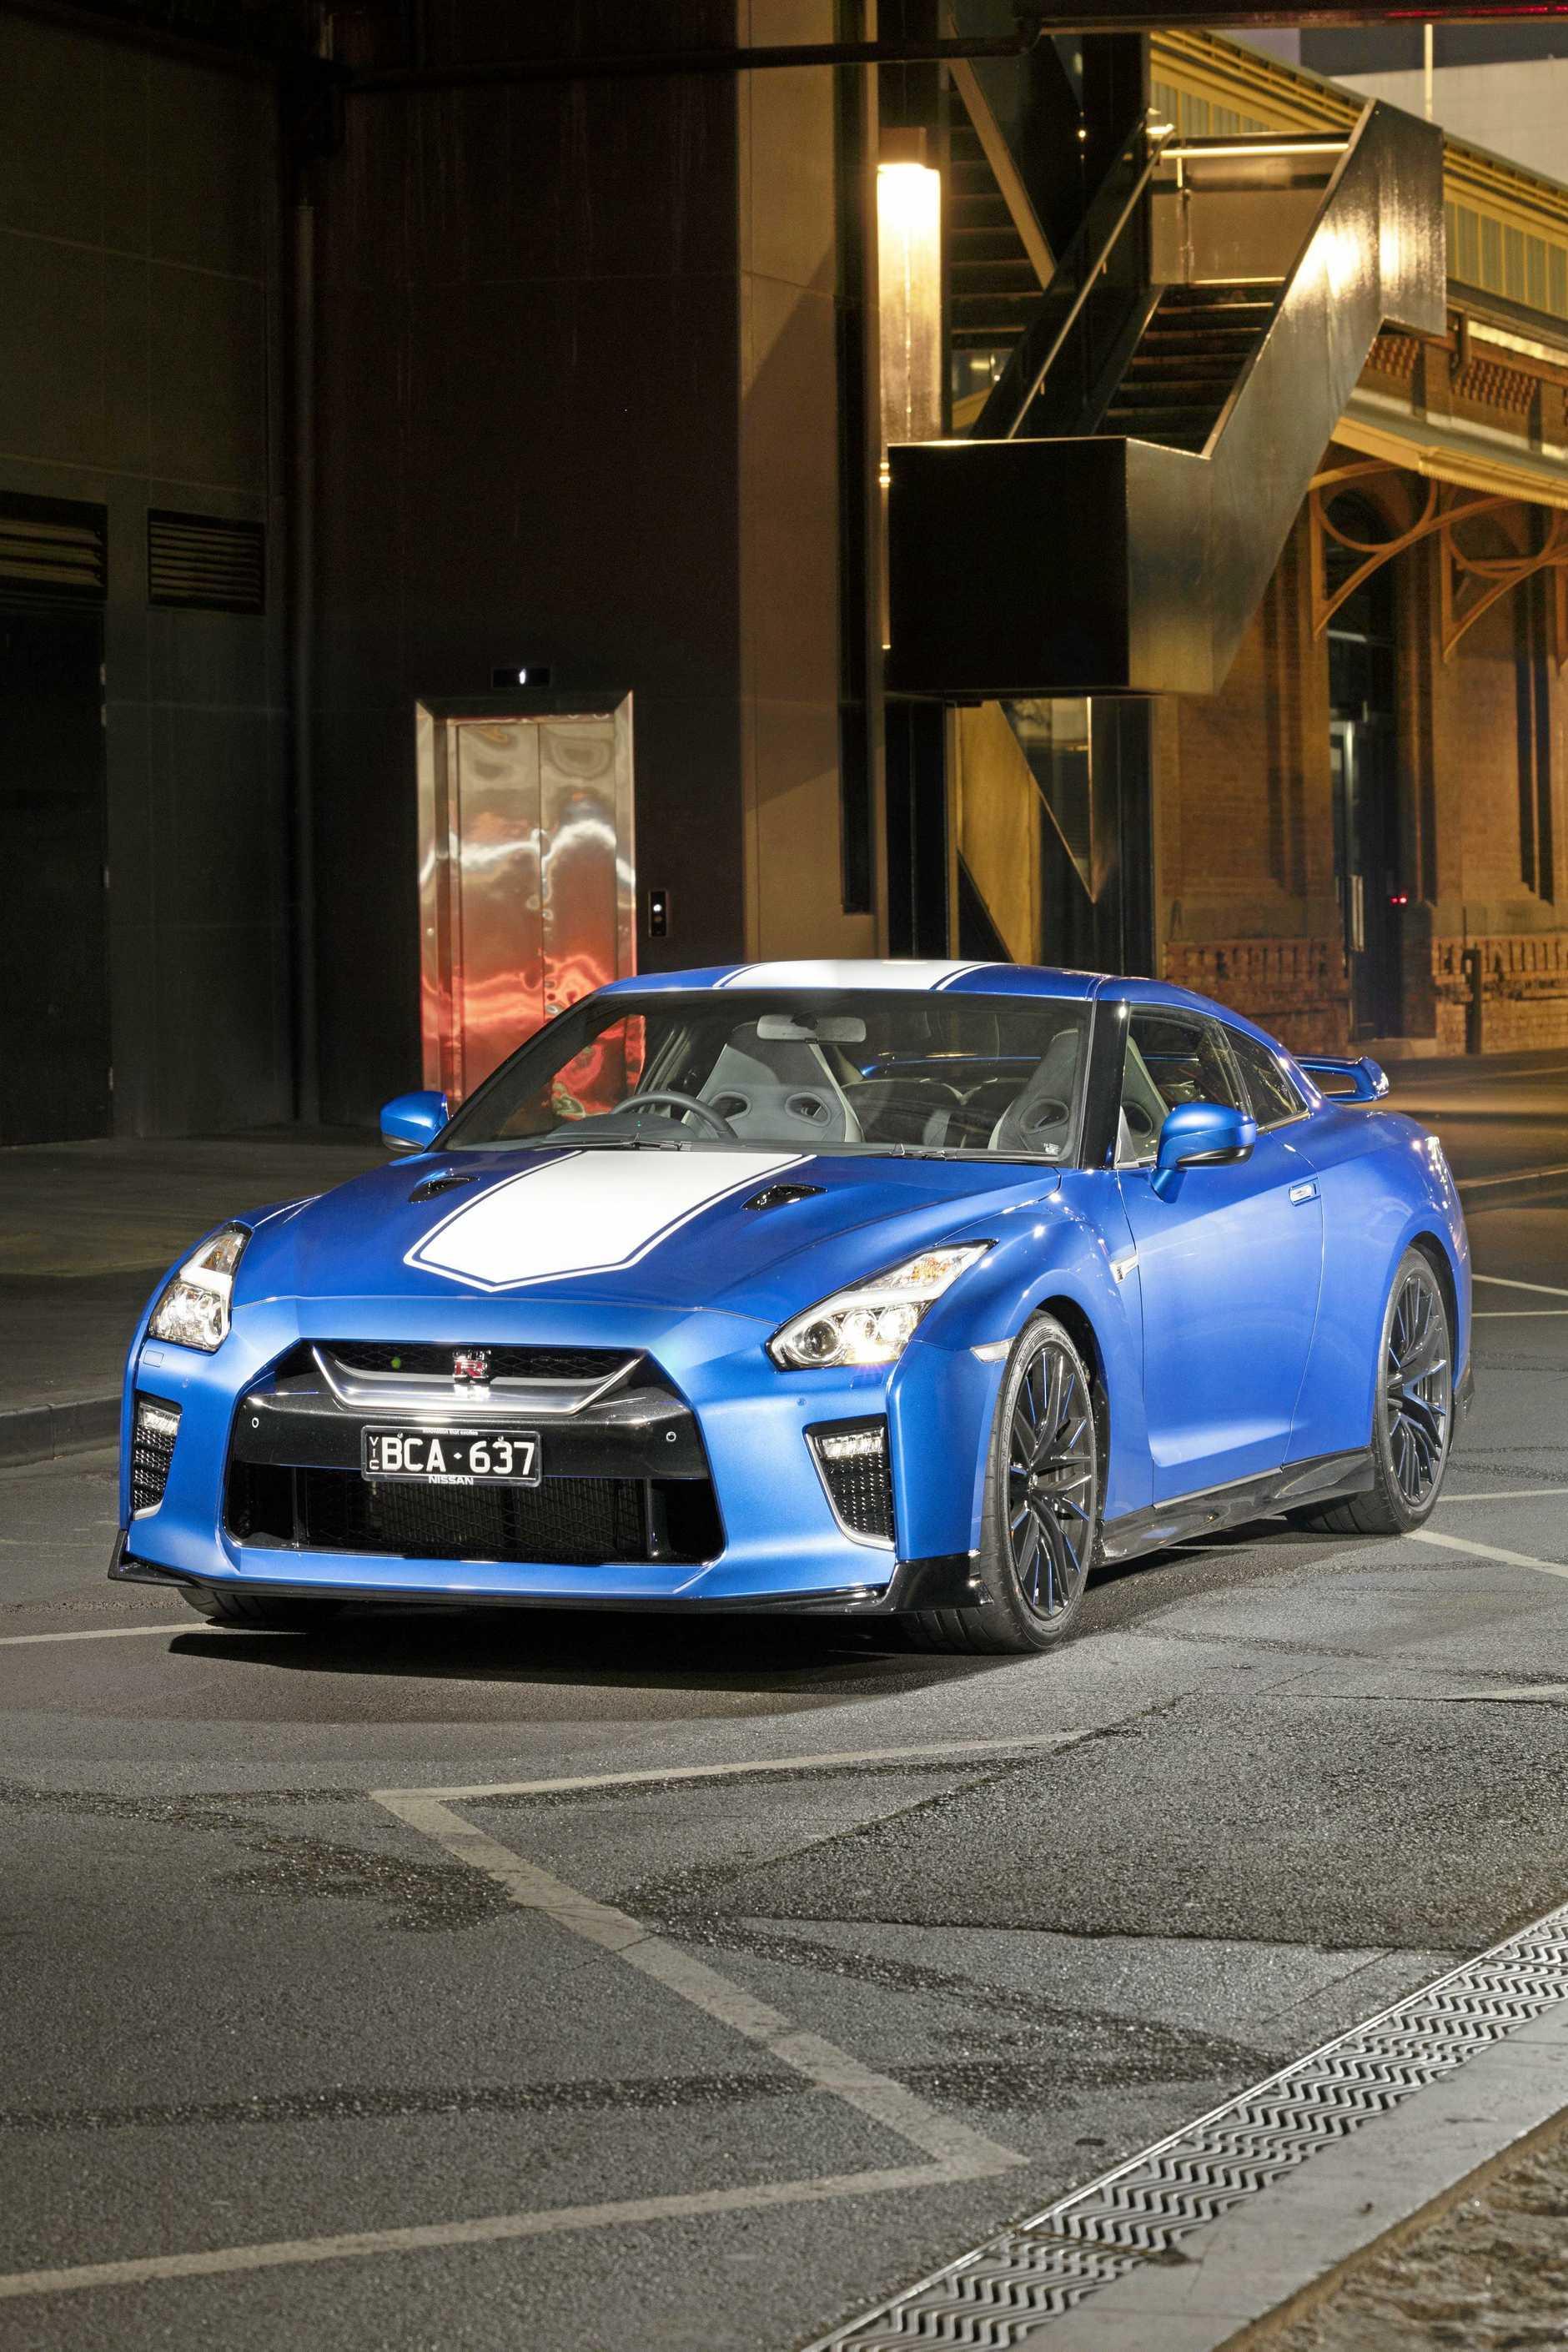 Thje 2020 model Nissan GT-R Premium Luxury 50th Anniversary.